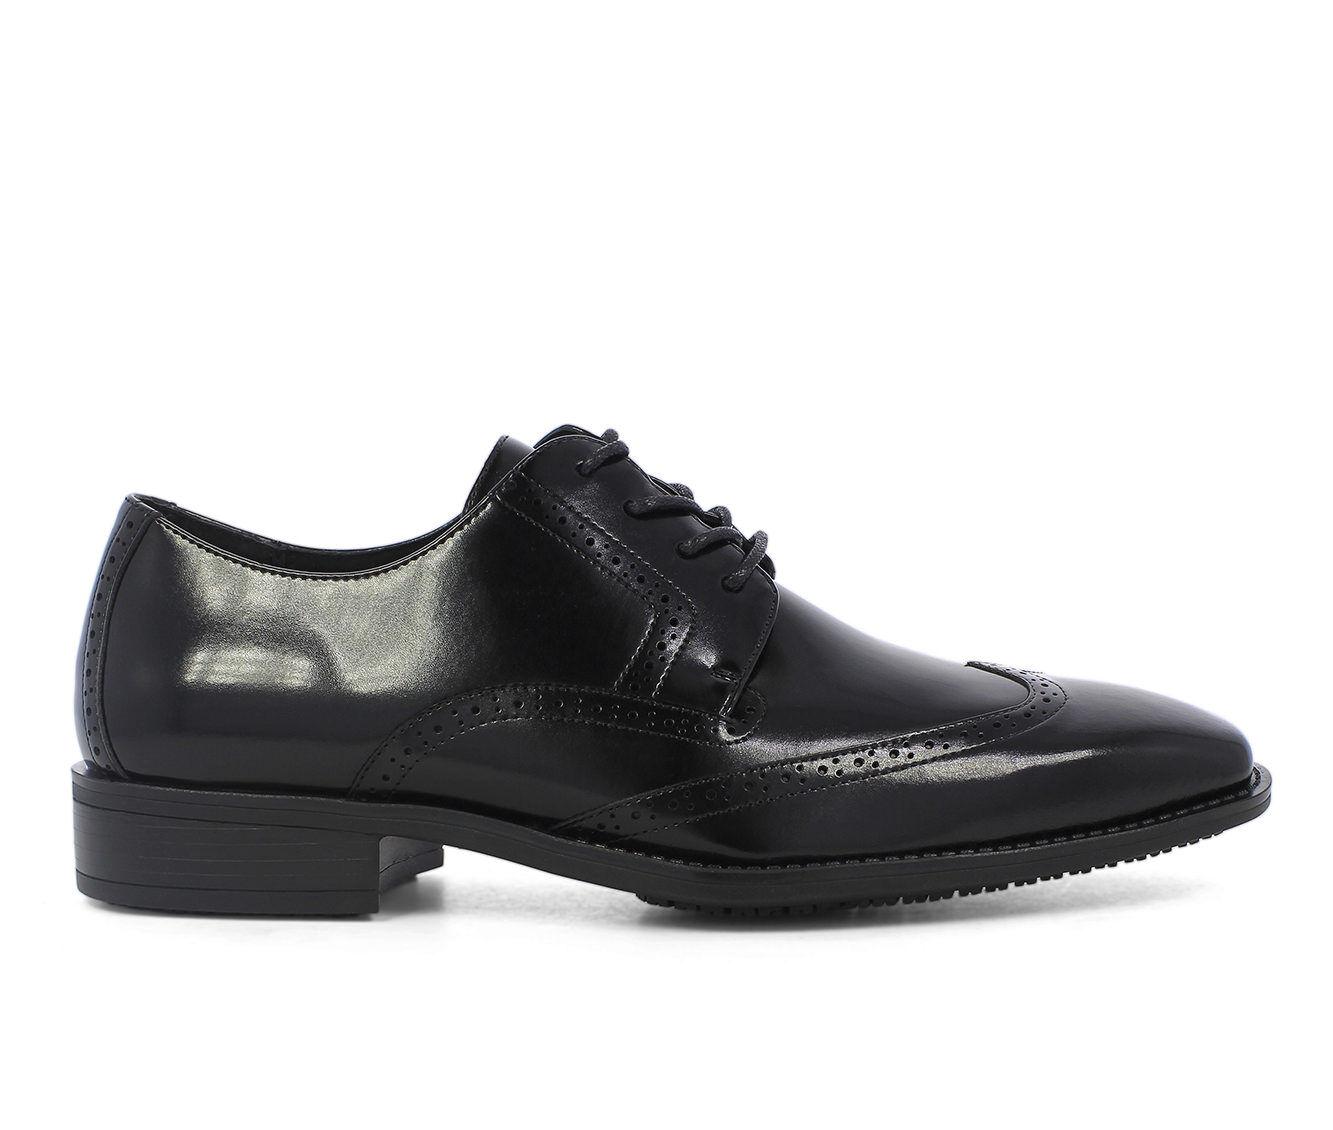 uk shoes_kd1042